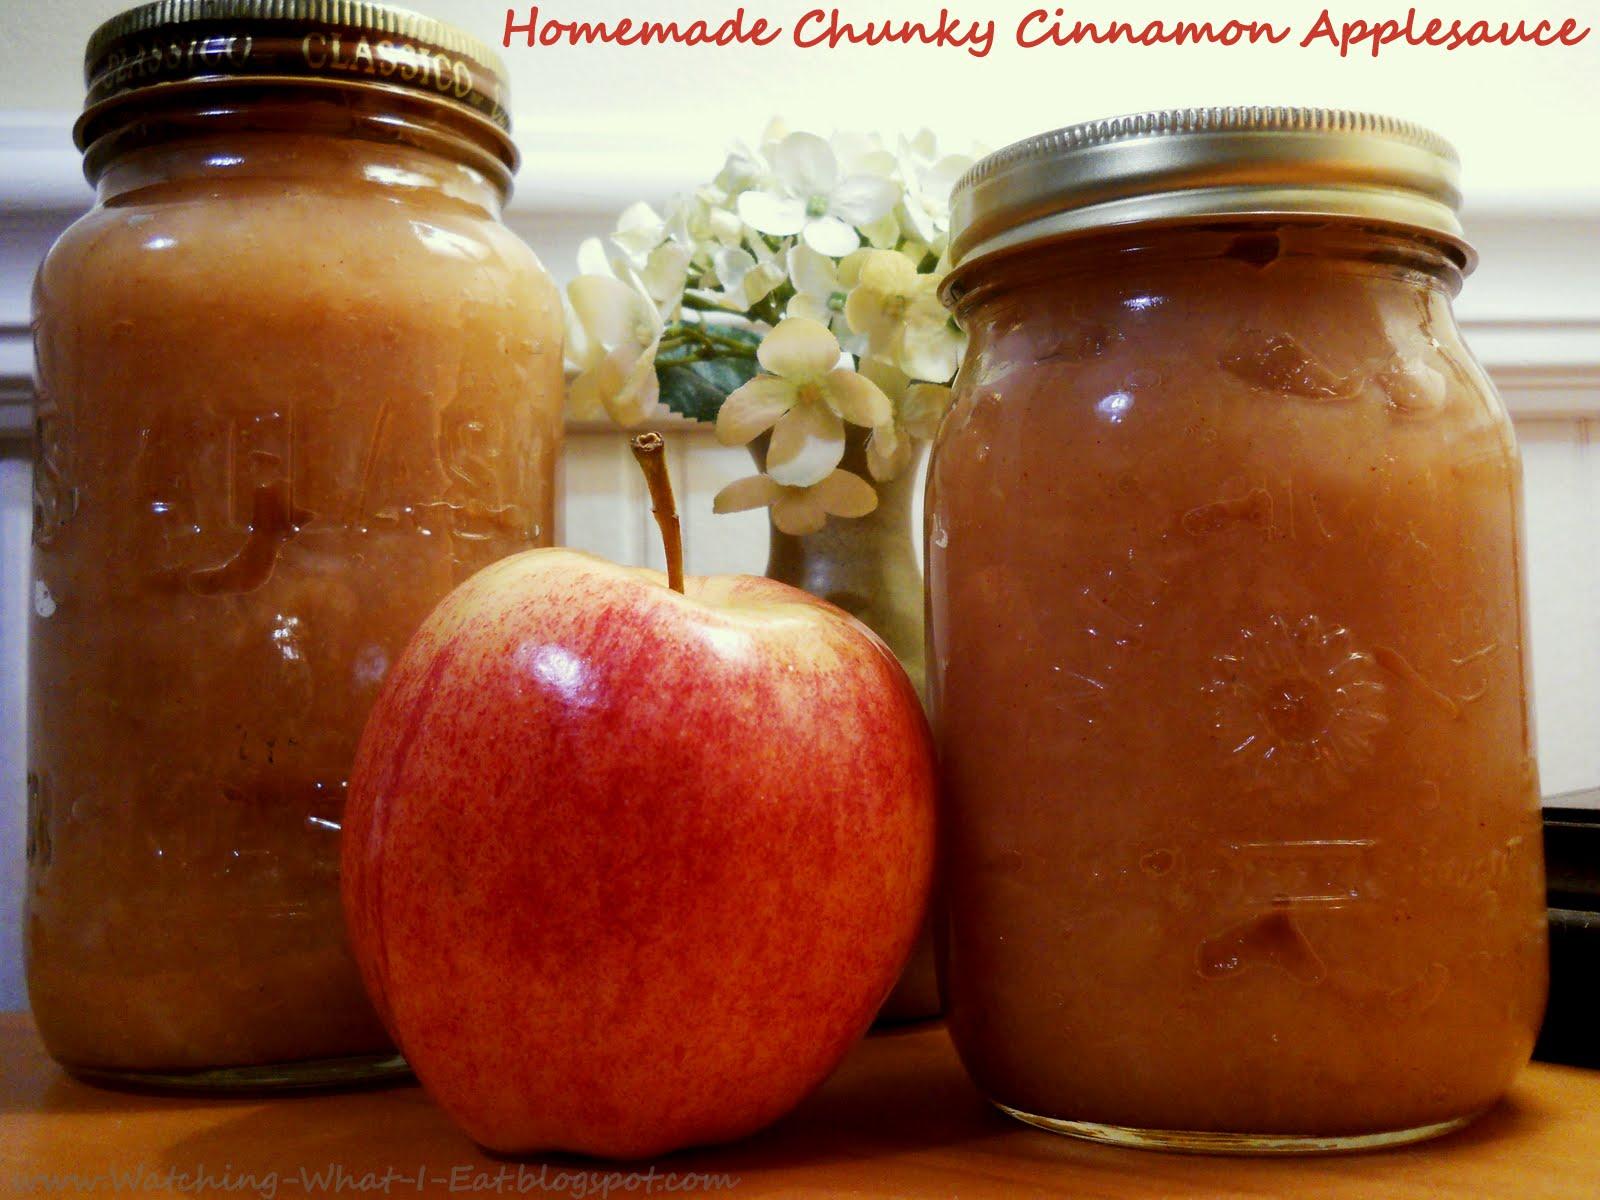 Watching What I Eat: Homemade Chunky Cinnamon Applesauce